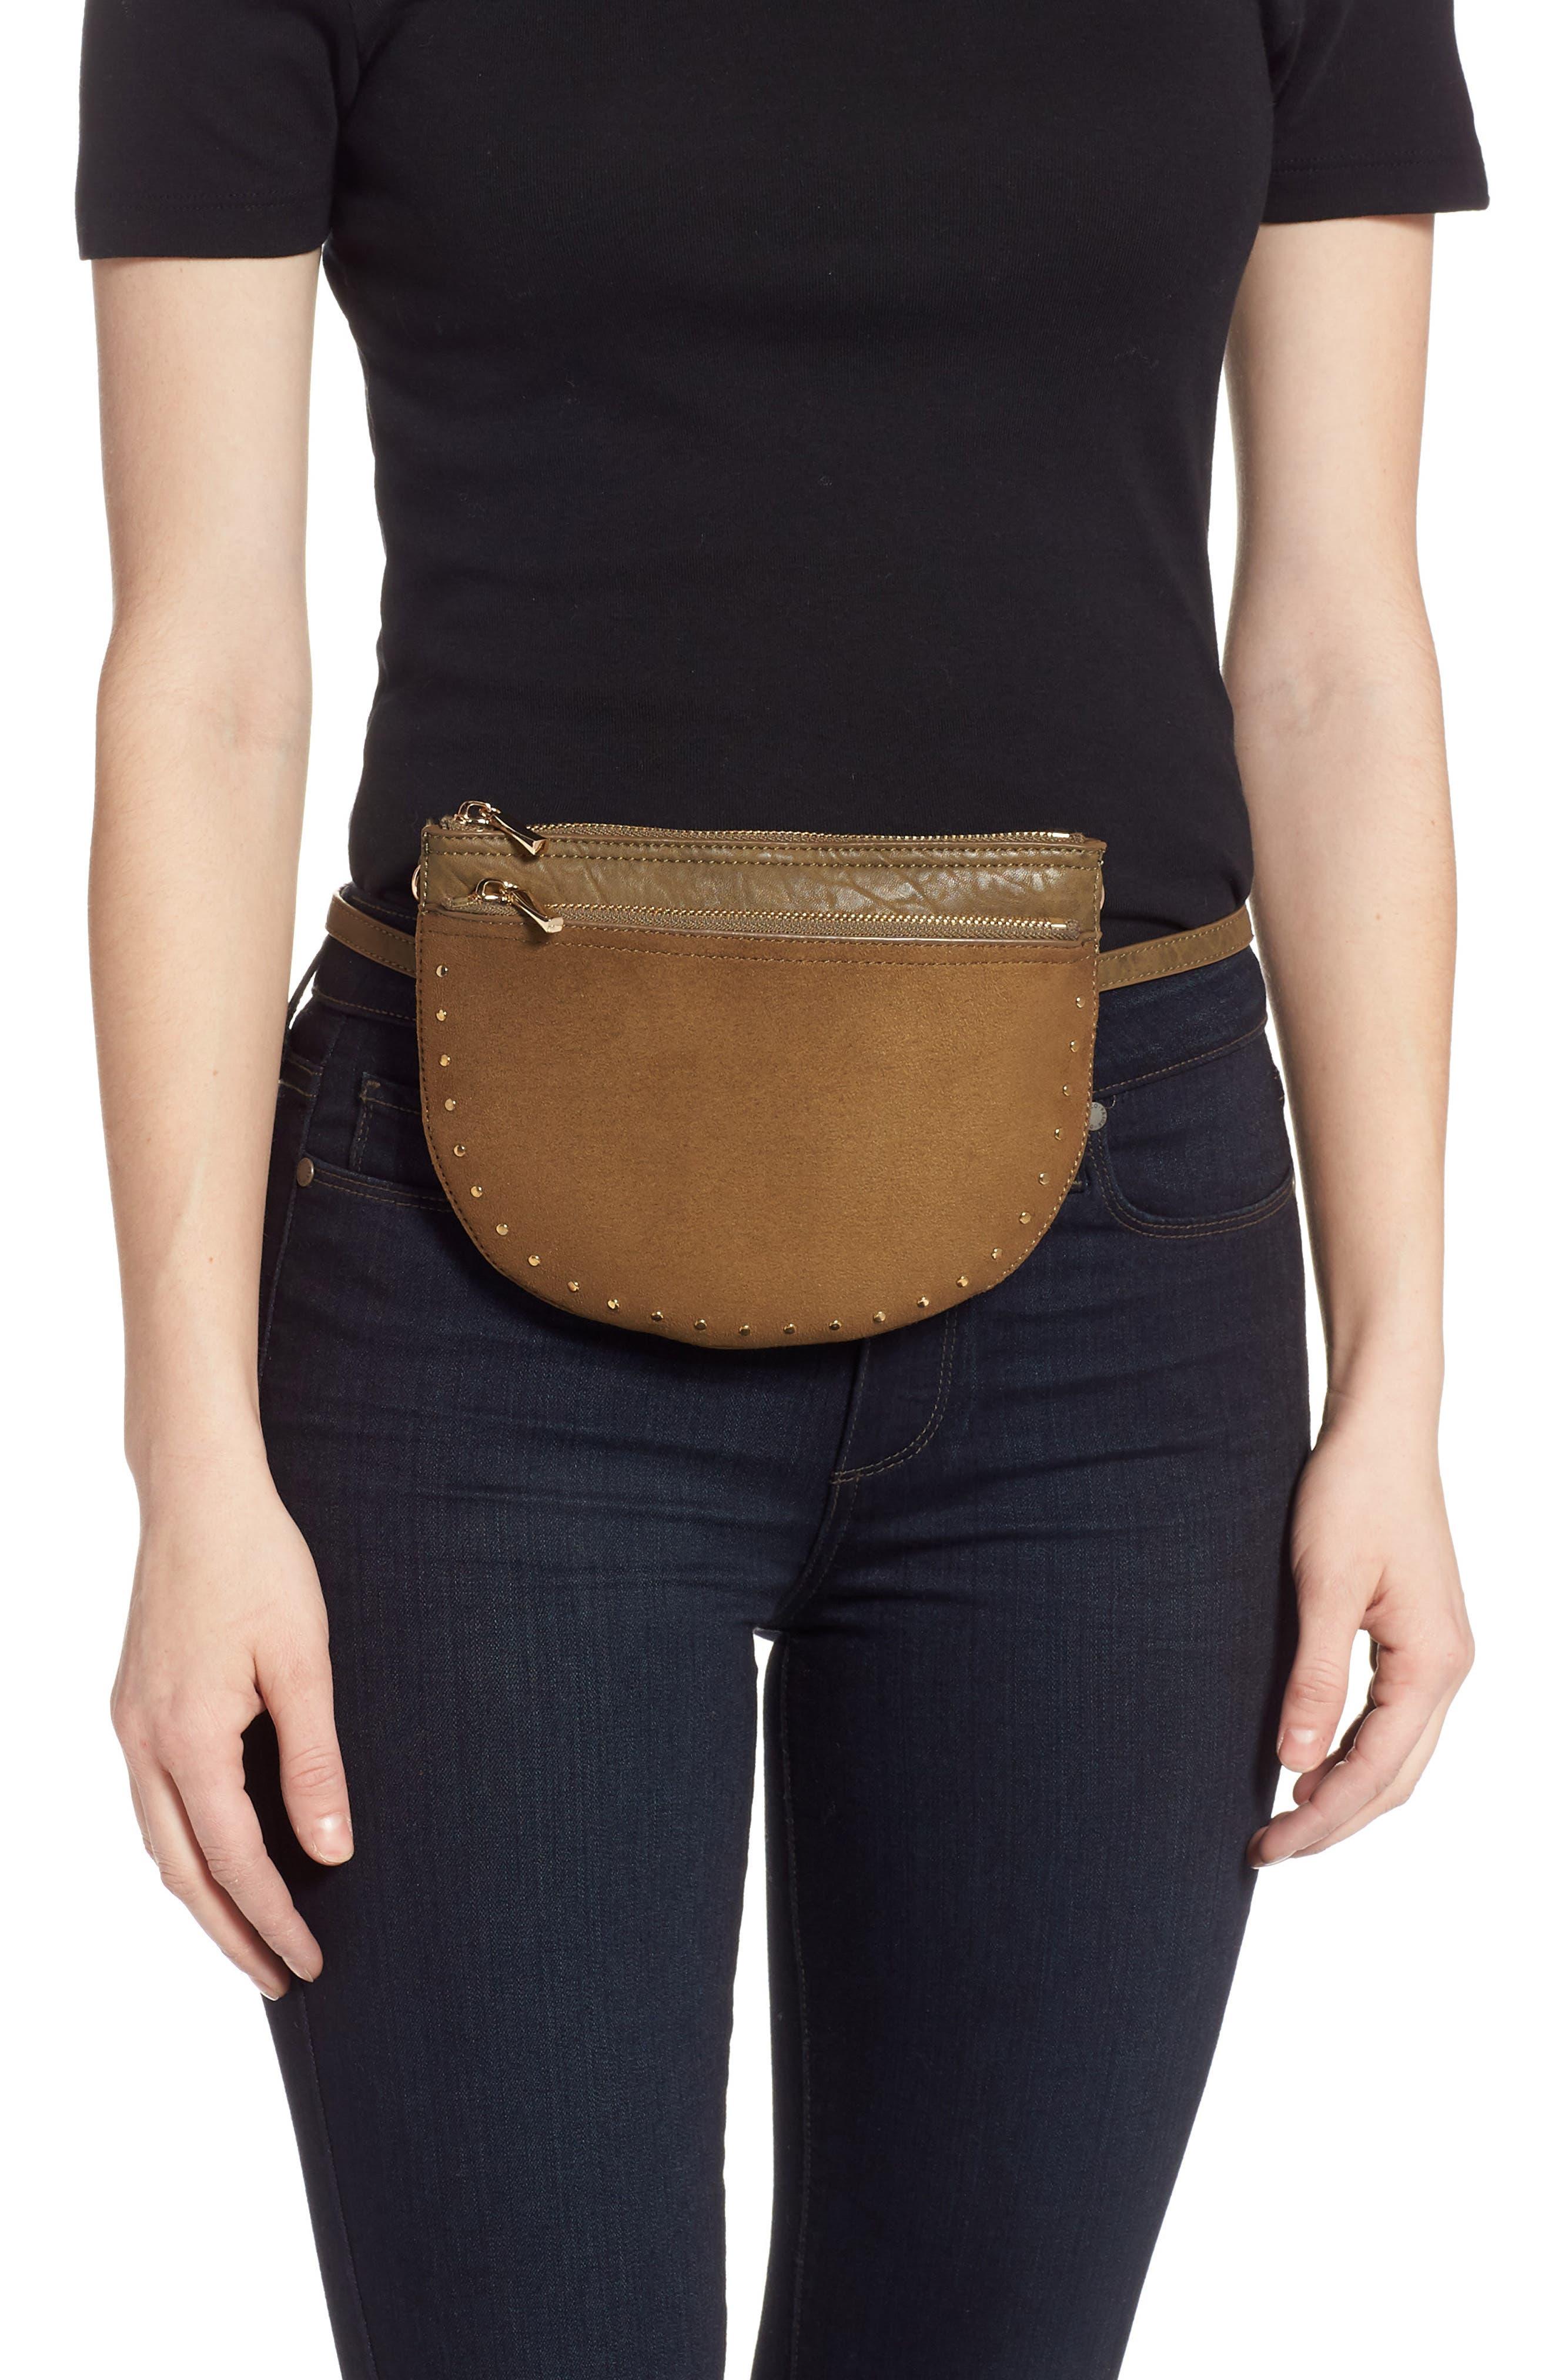 SOLE SOCIETY, Jeana Studded Convertible Belt Bag, Alternate thumbnail 2, color, OLIVE